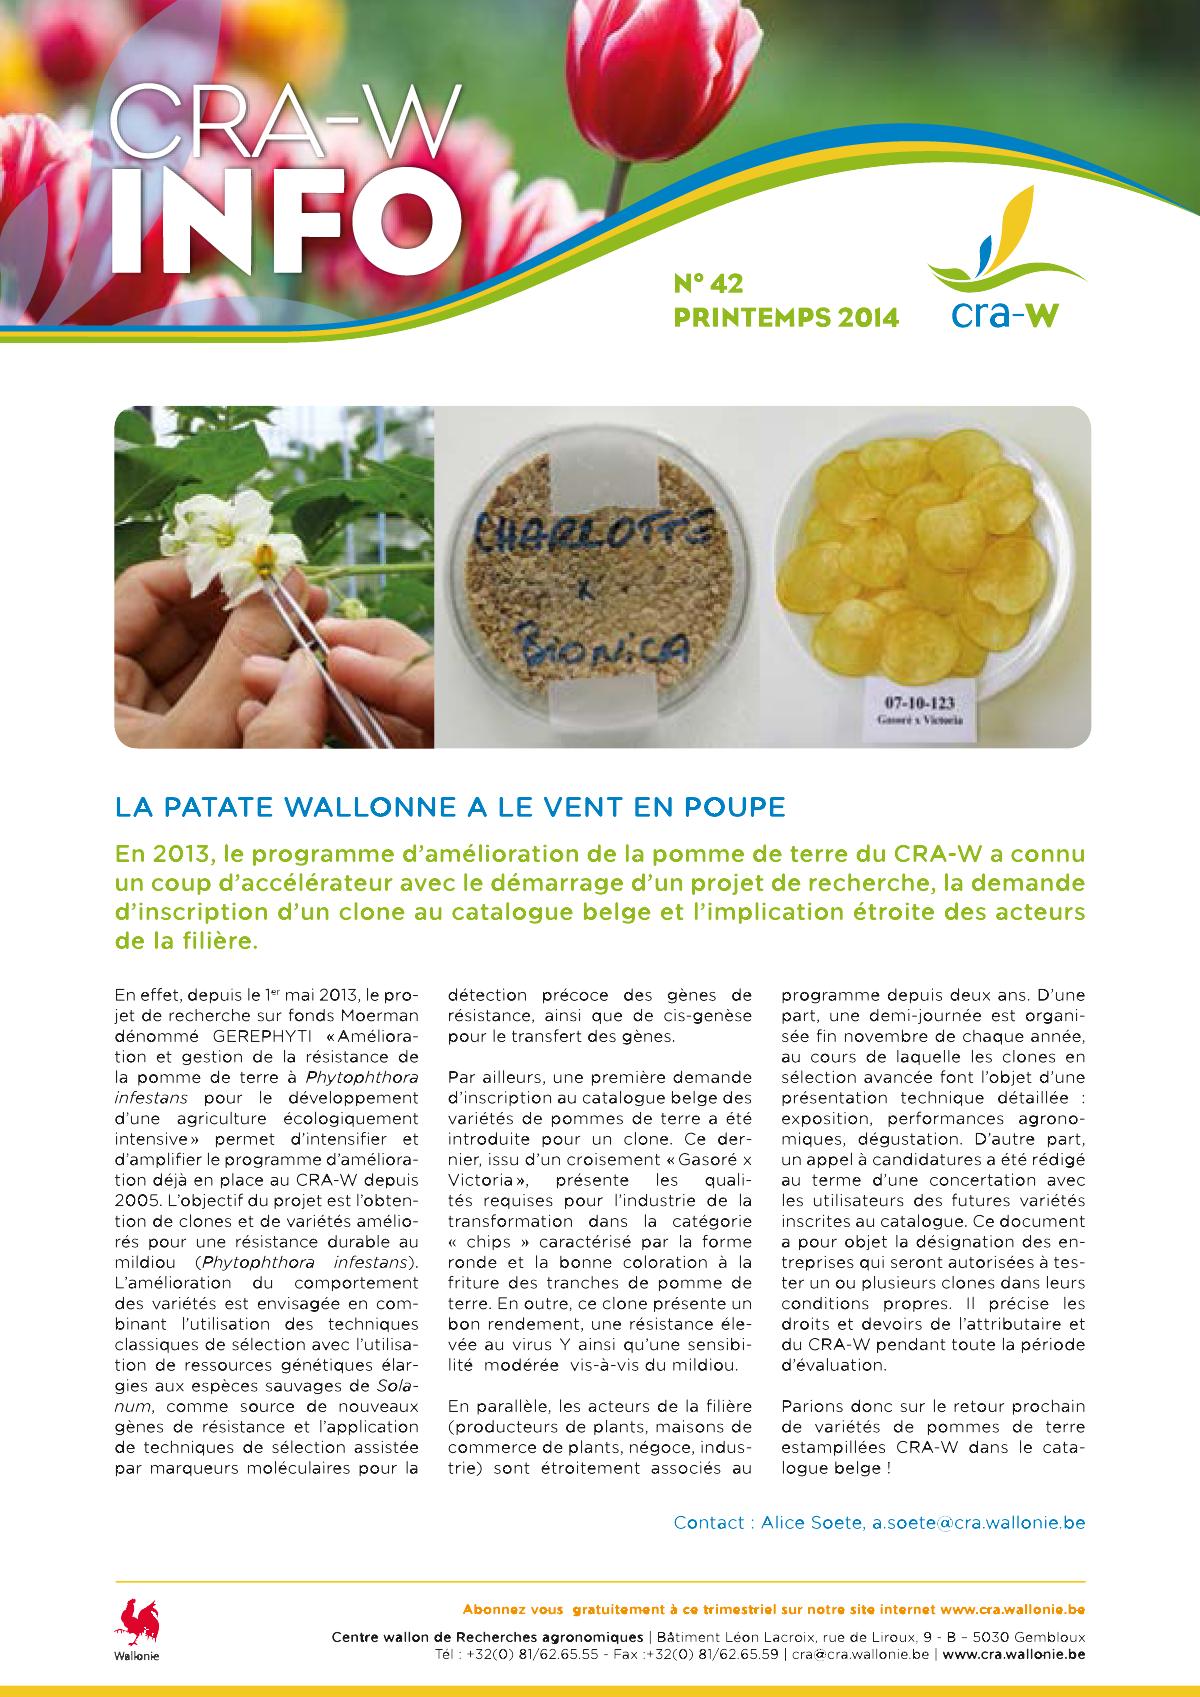 CRAW info n° 42